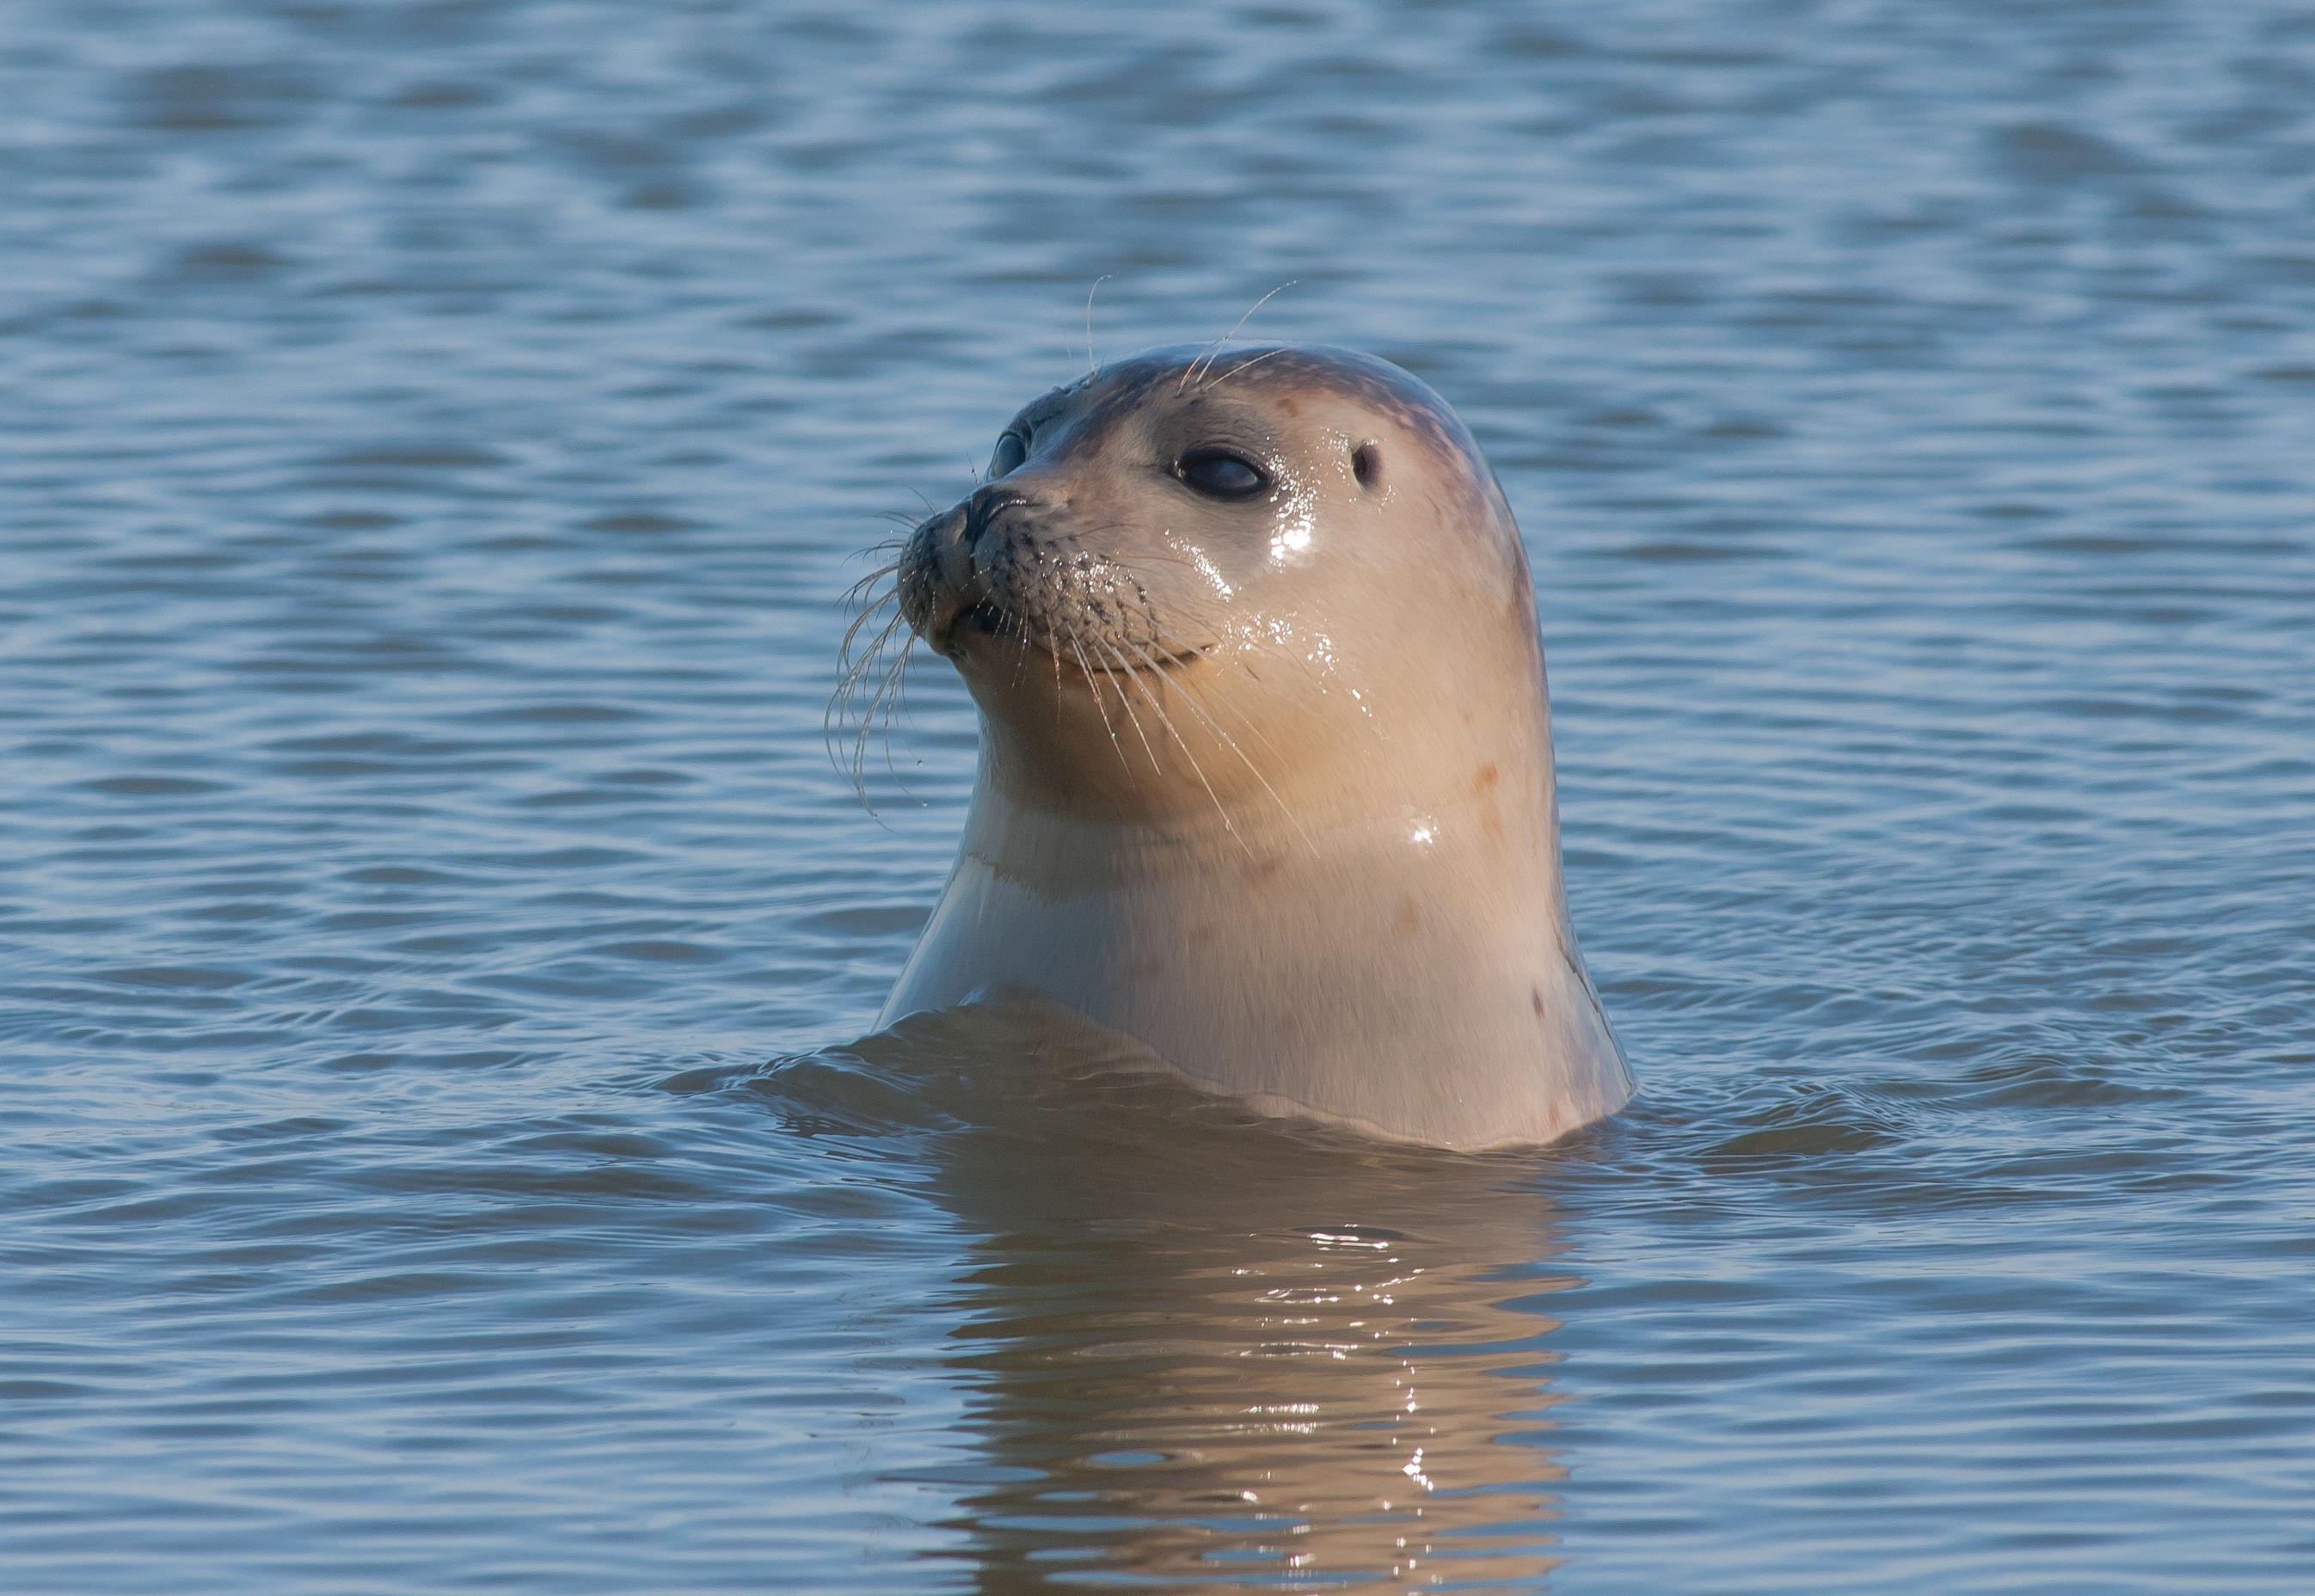 De gewone zeehond in Nederland